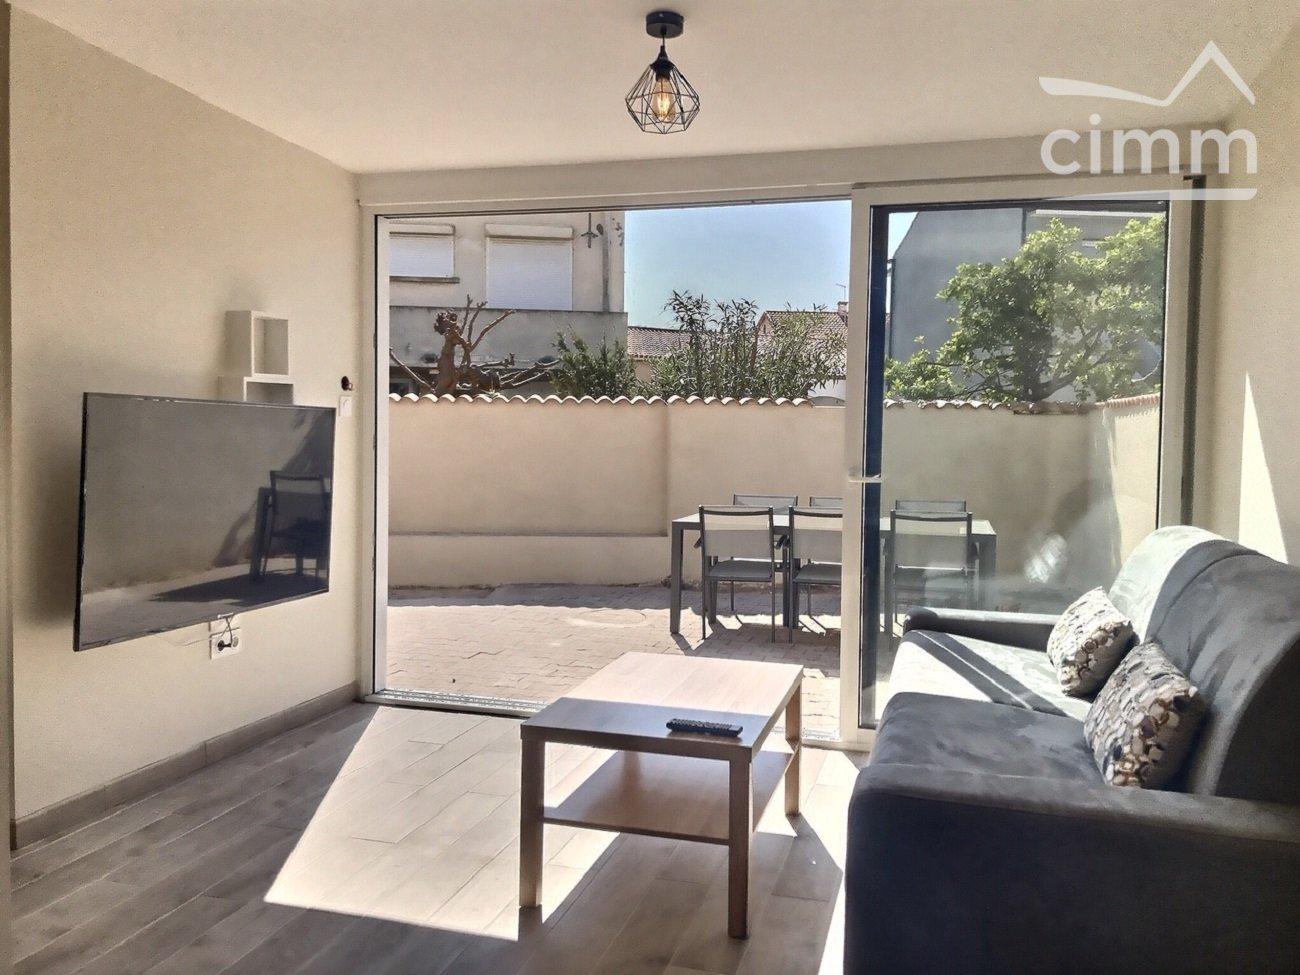 Image - Appartement - VALRAS PLAGE - Location Vacances - 47m² - IMMOPLAGE VALRAS-PLAGE